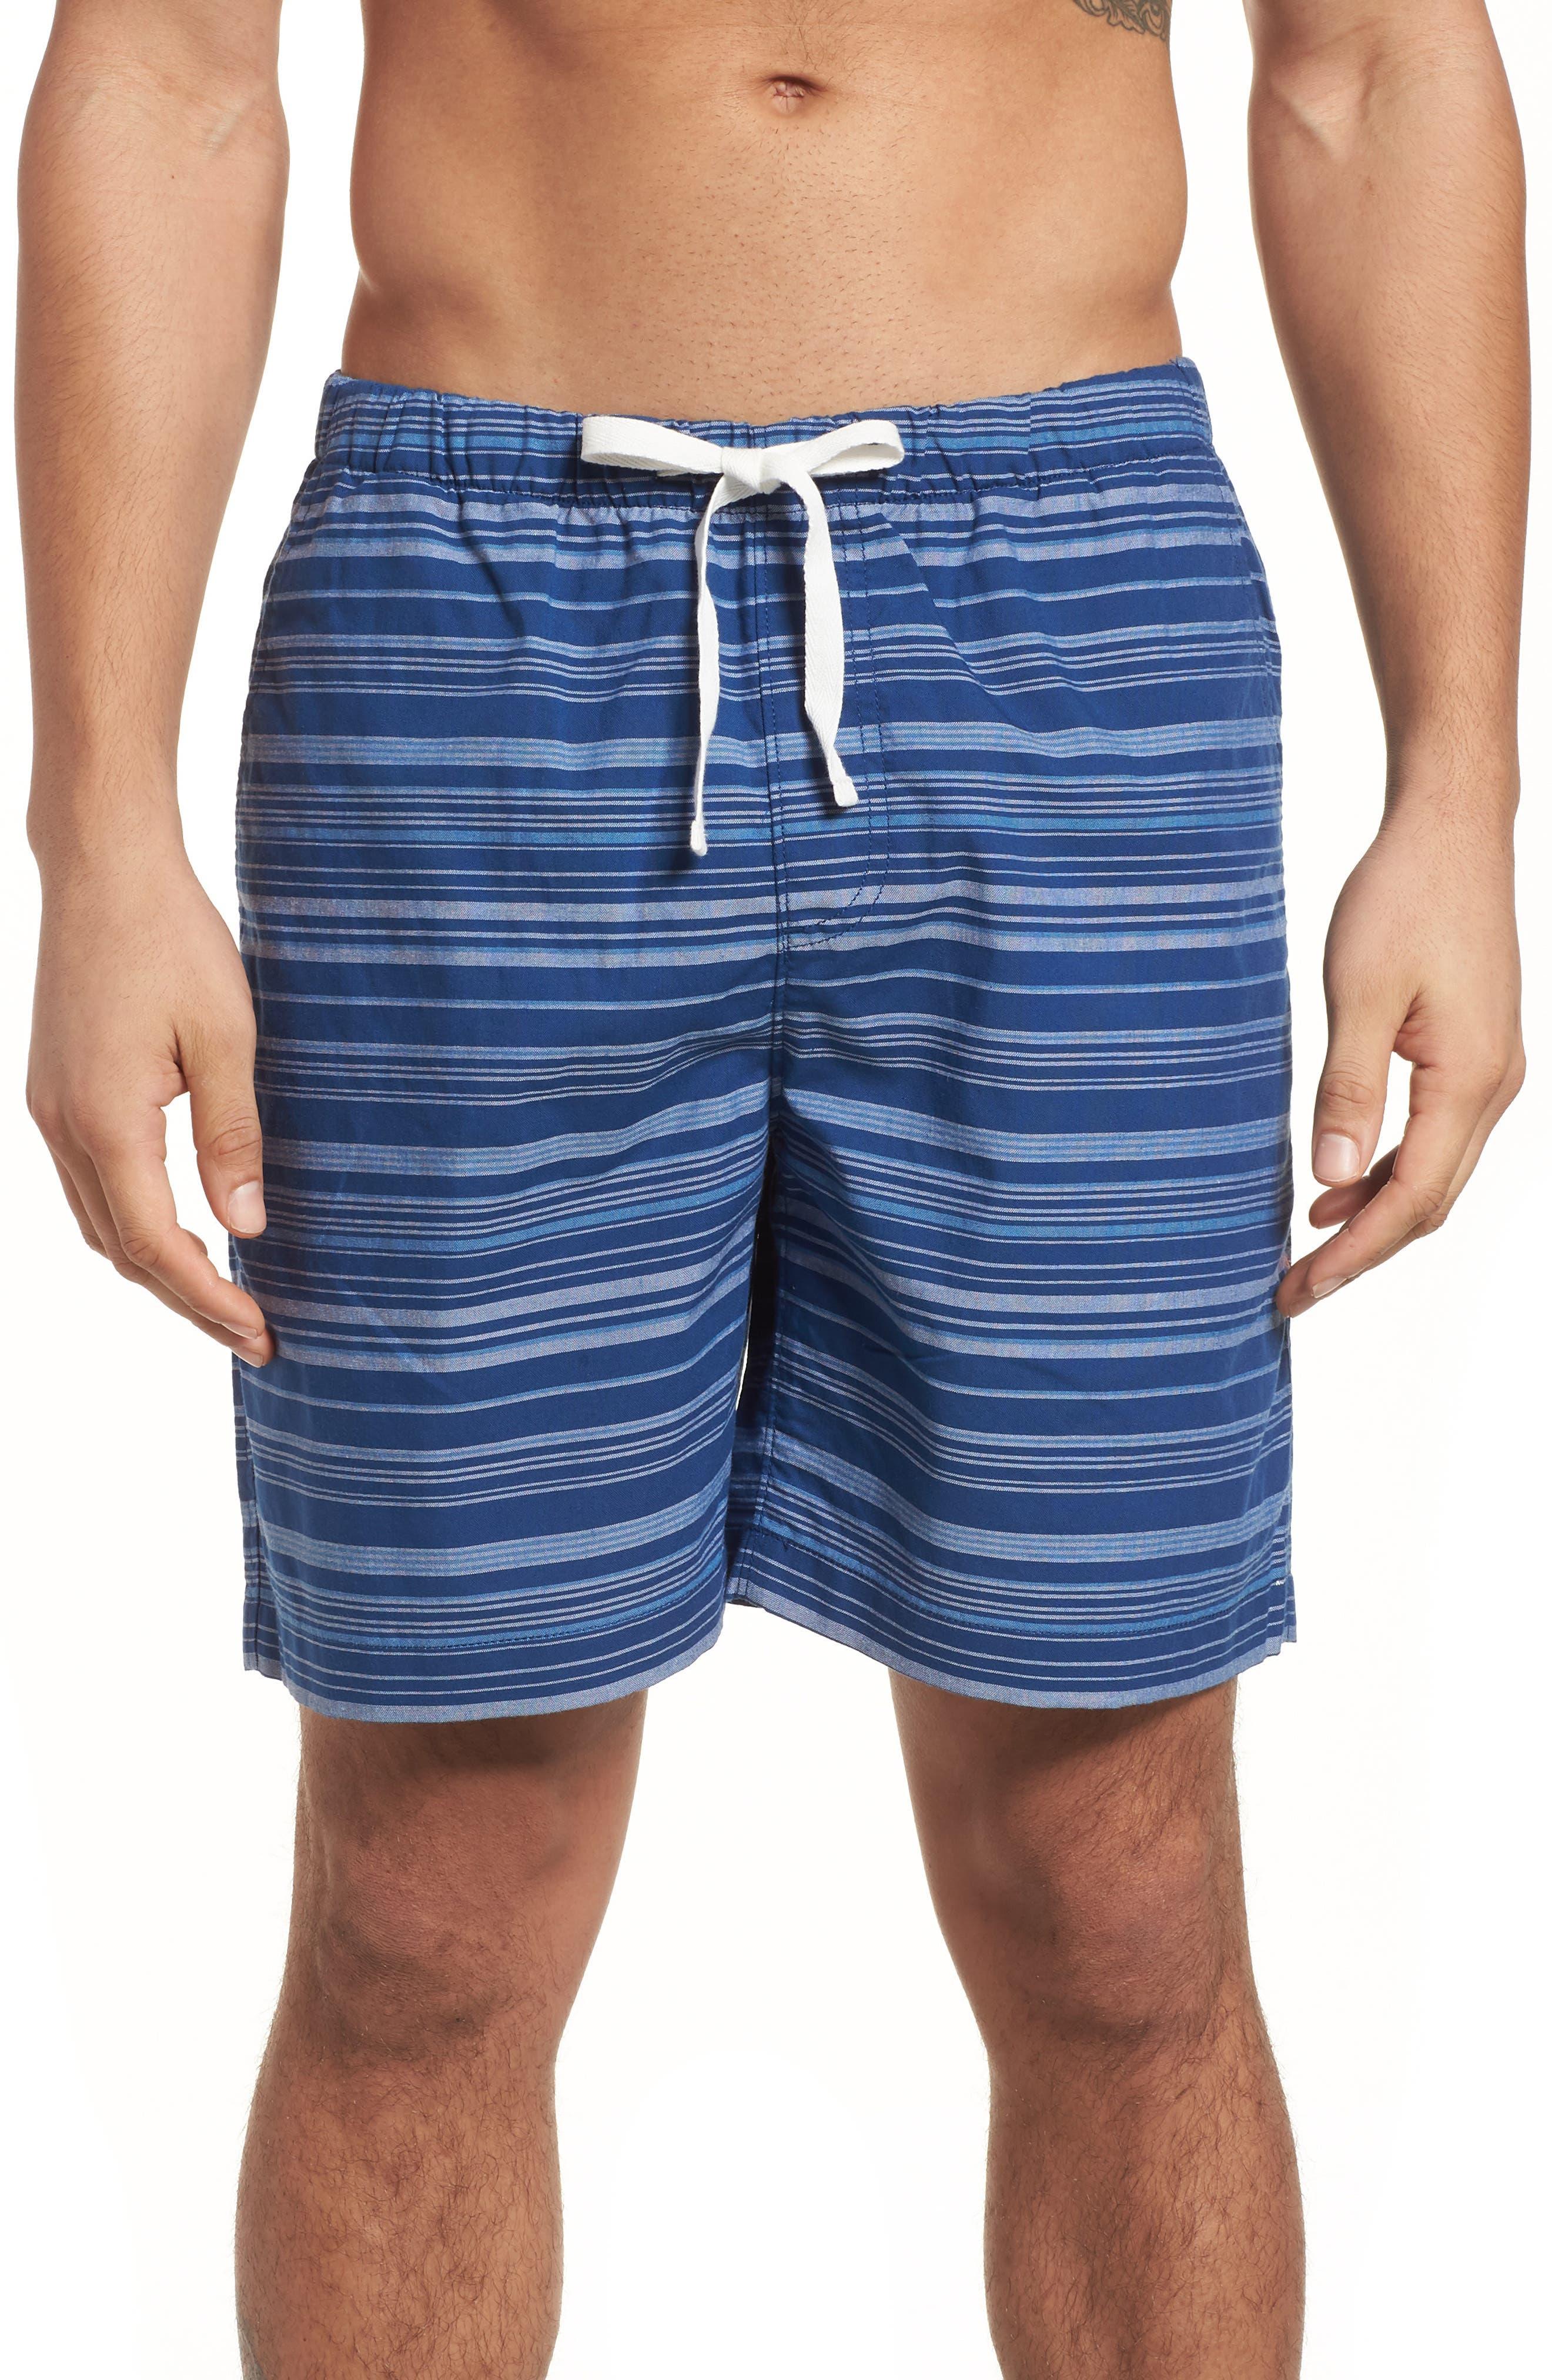 Hammock Board Shorts,                             Main thumbnail 1, color,                             Seven Seas Blue